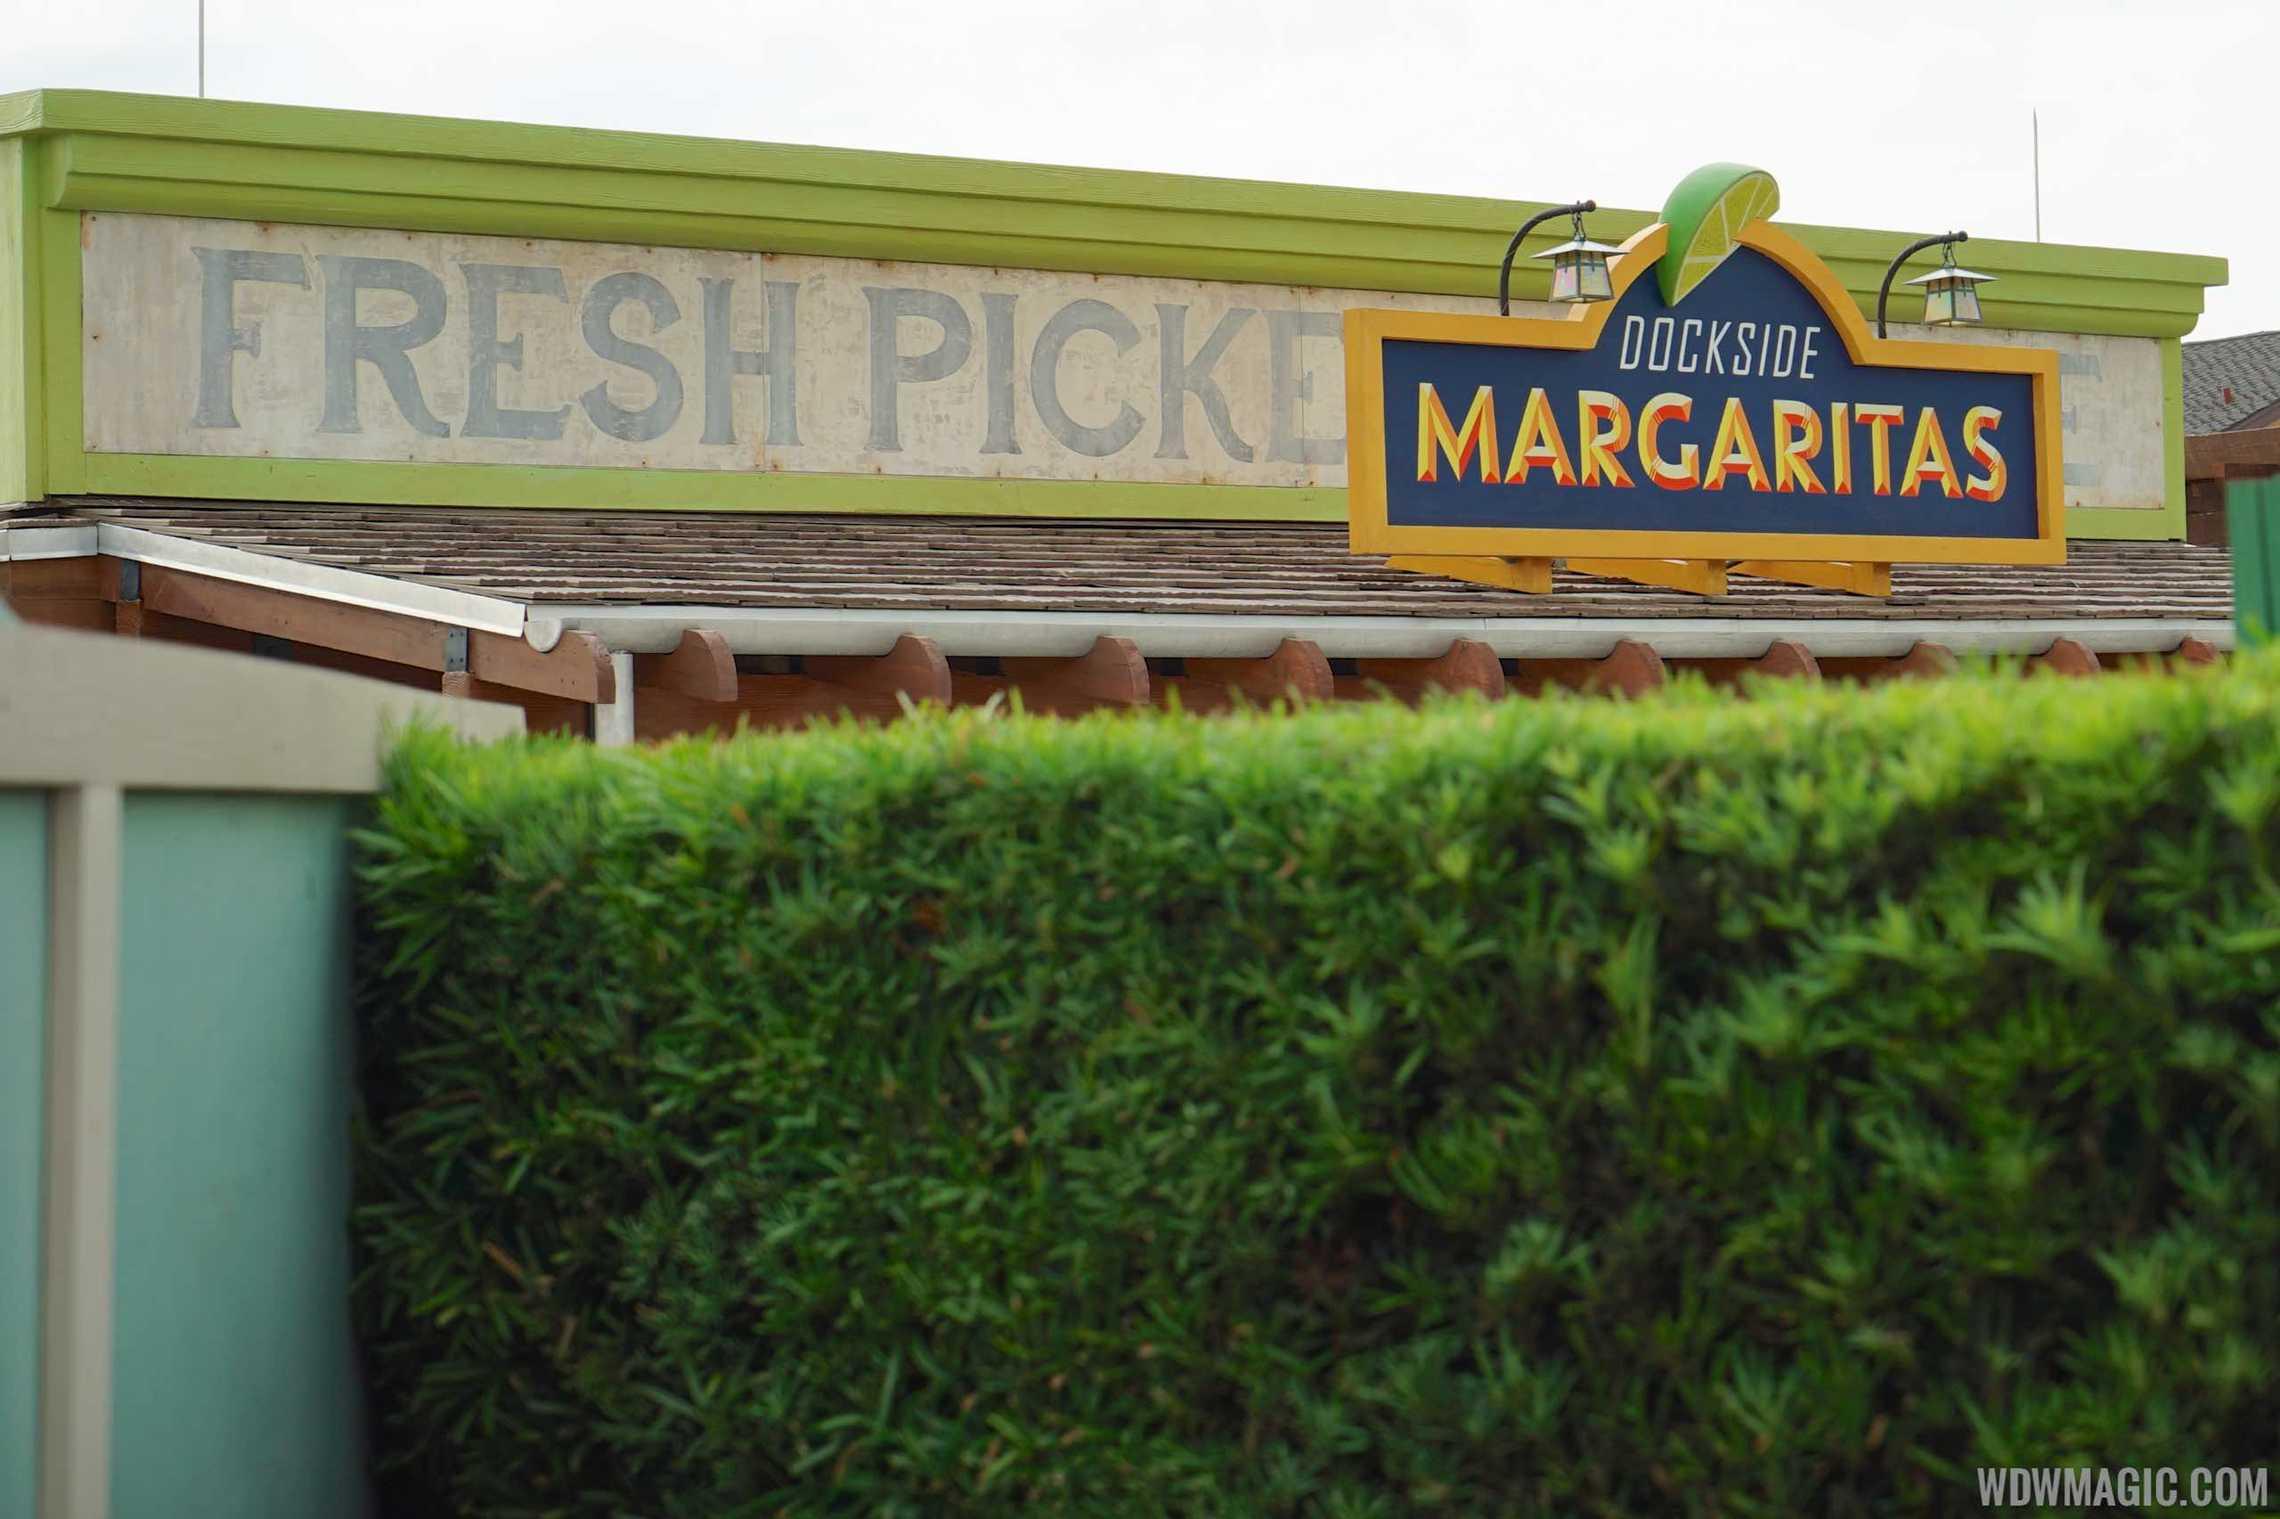 Dockside Margaritas